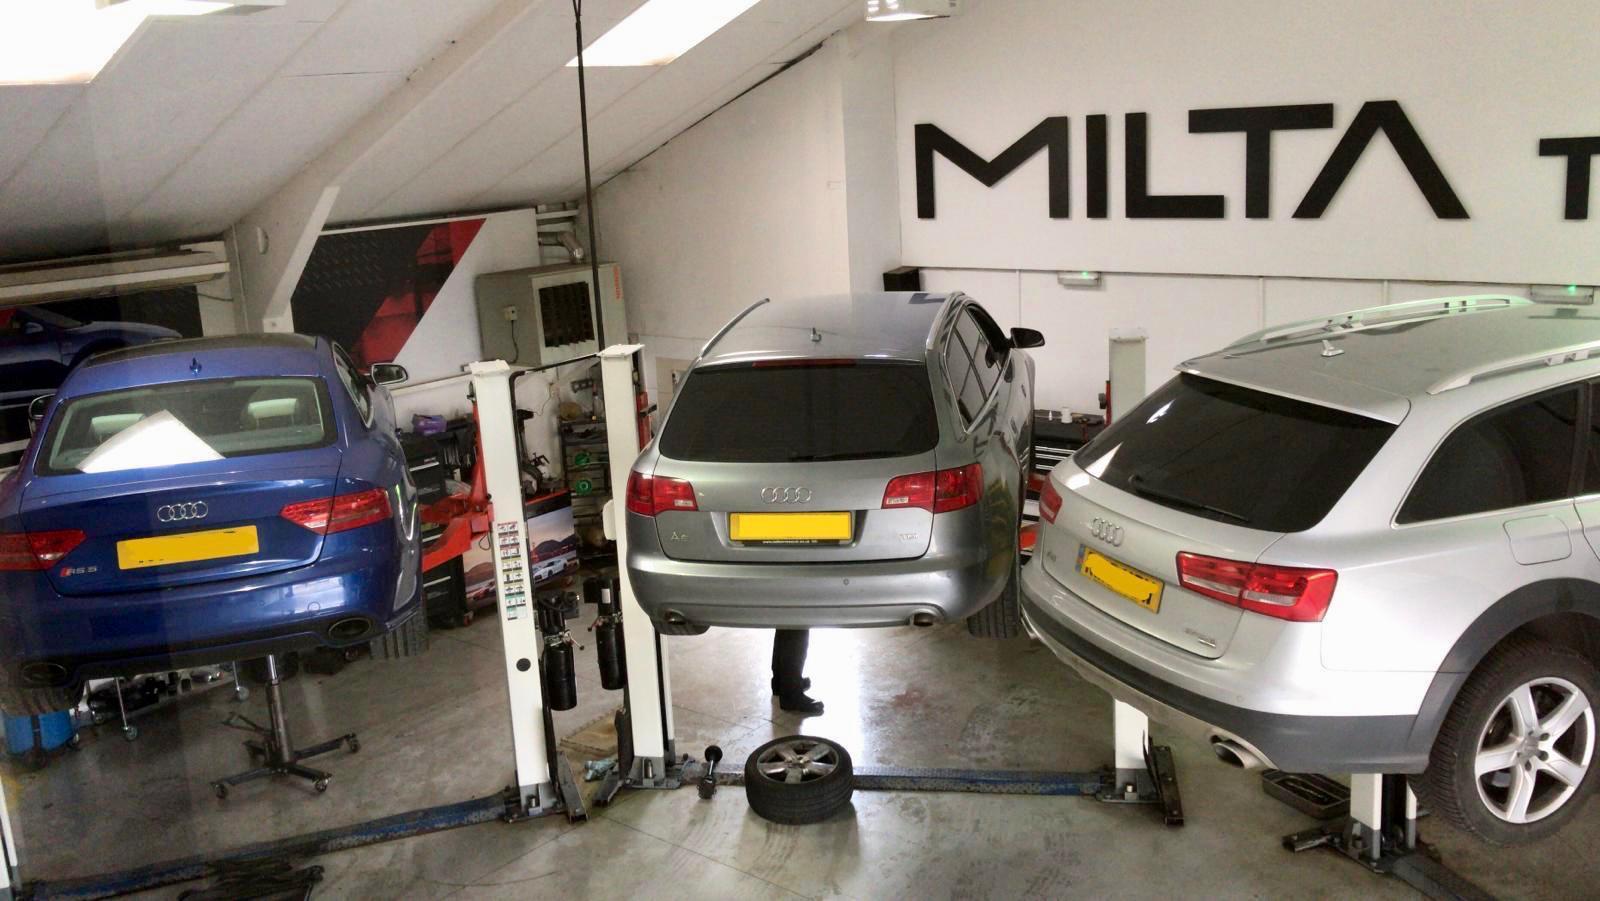 Our Gallery - Milta seen through the lens MILTA Technology